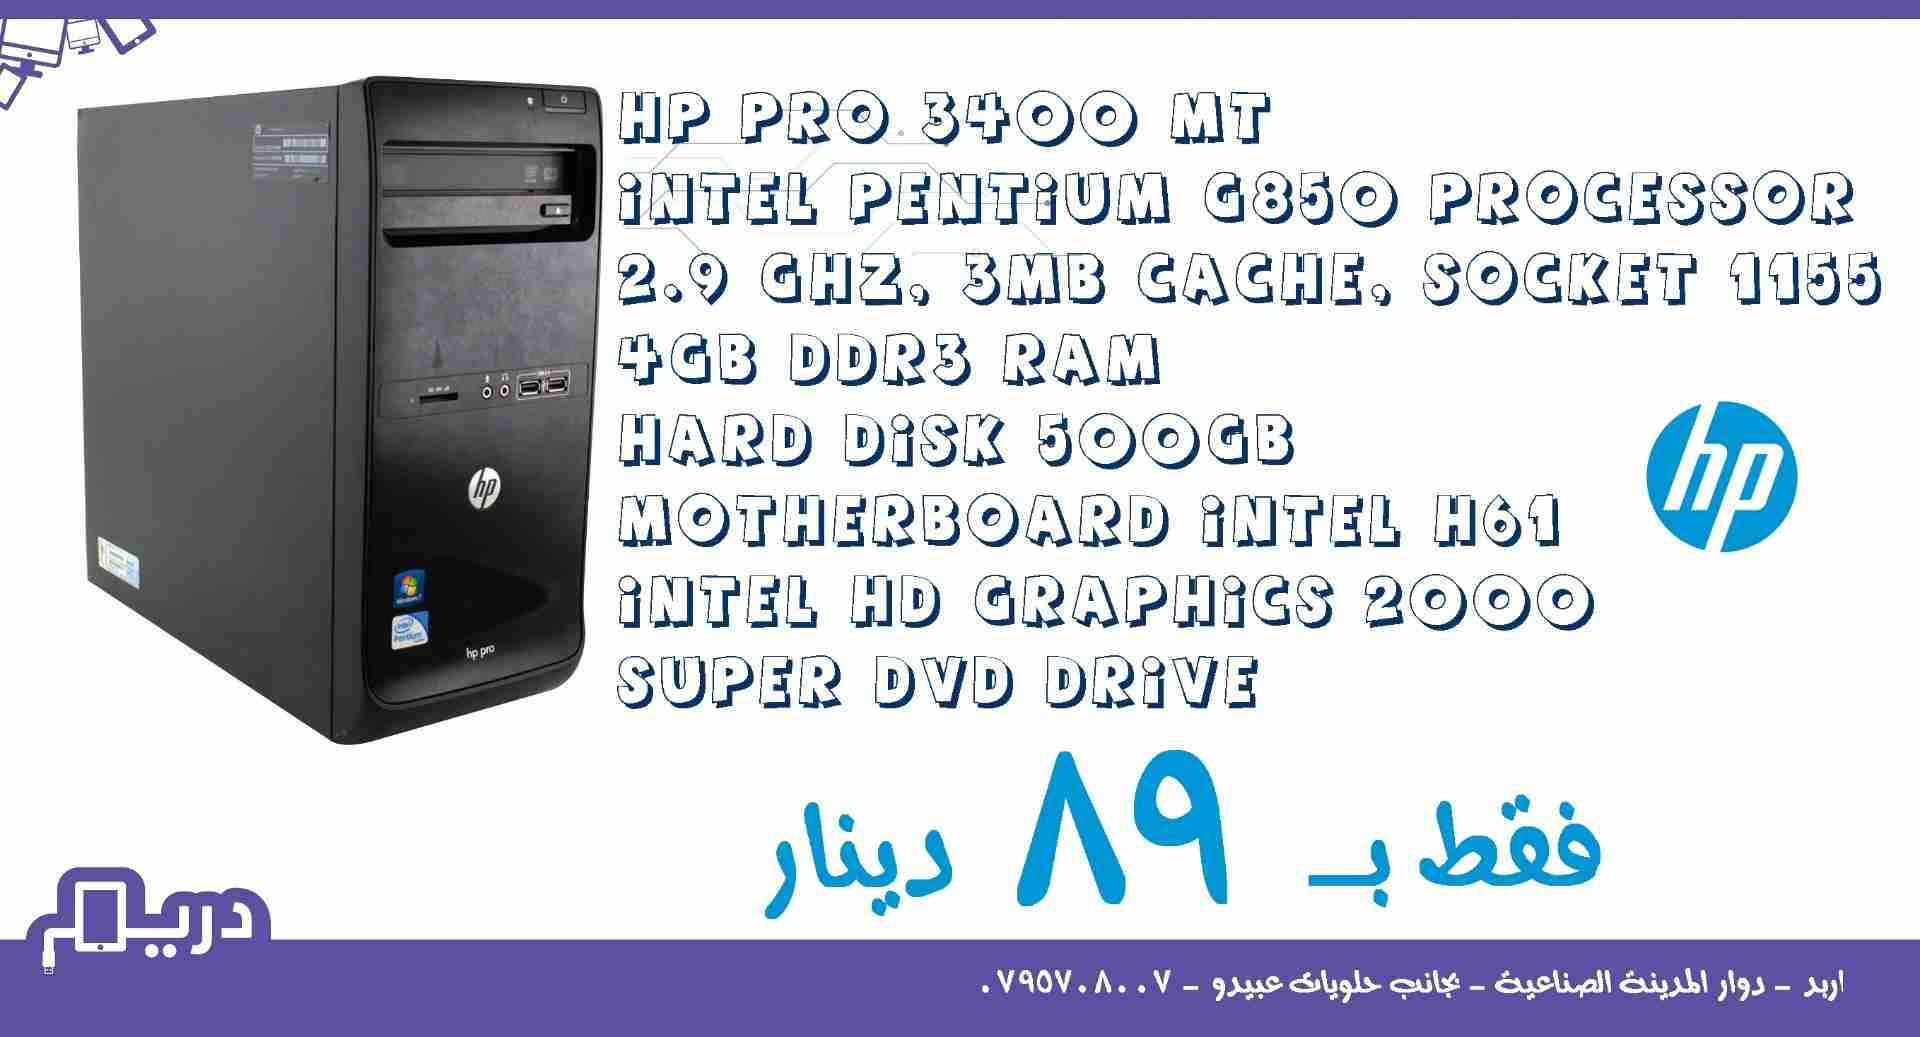 Dell - Inspiron / 16GB RAM, i7, 3.2MHz, 2in1 Laptop-  HP Pro 3400MT Socket 1155...